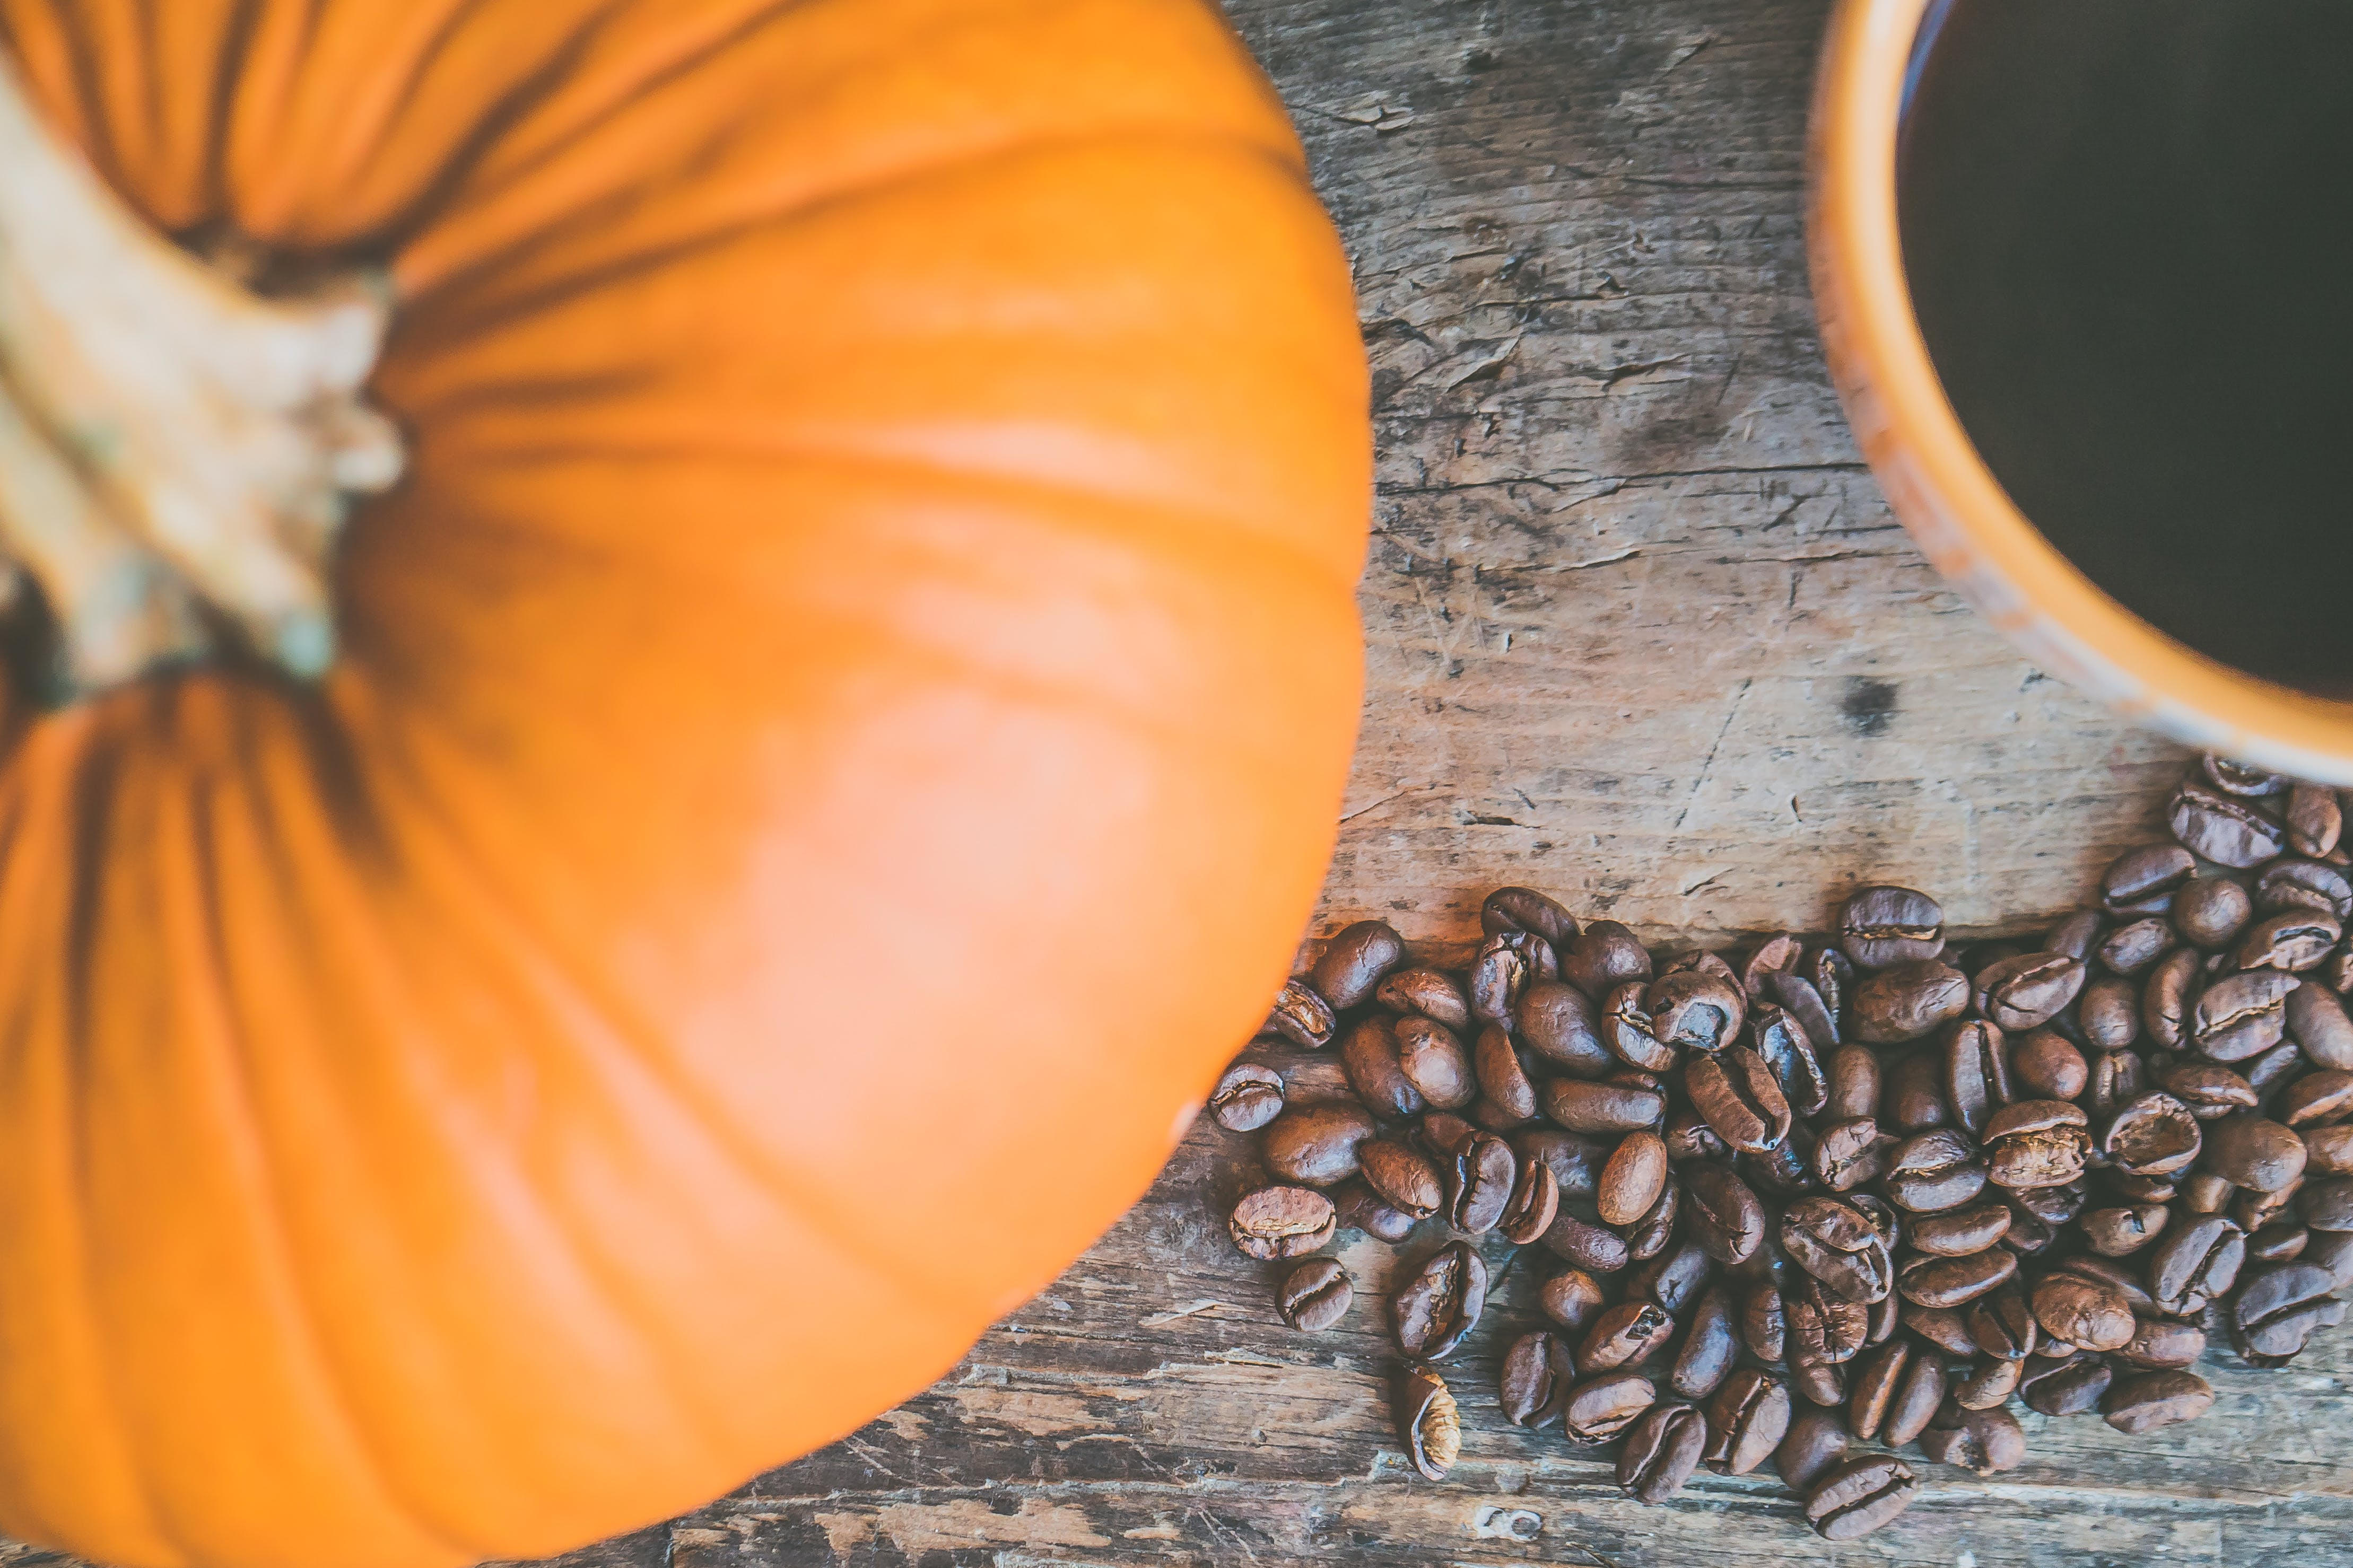 Orange Pumpkin and Coffee Beans